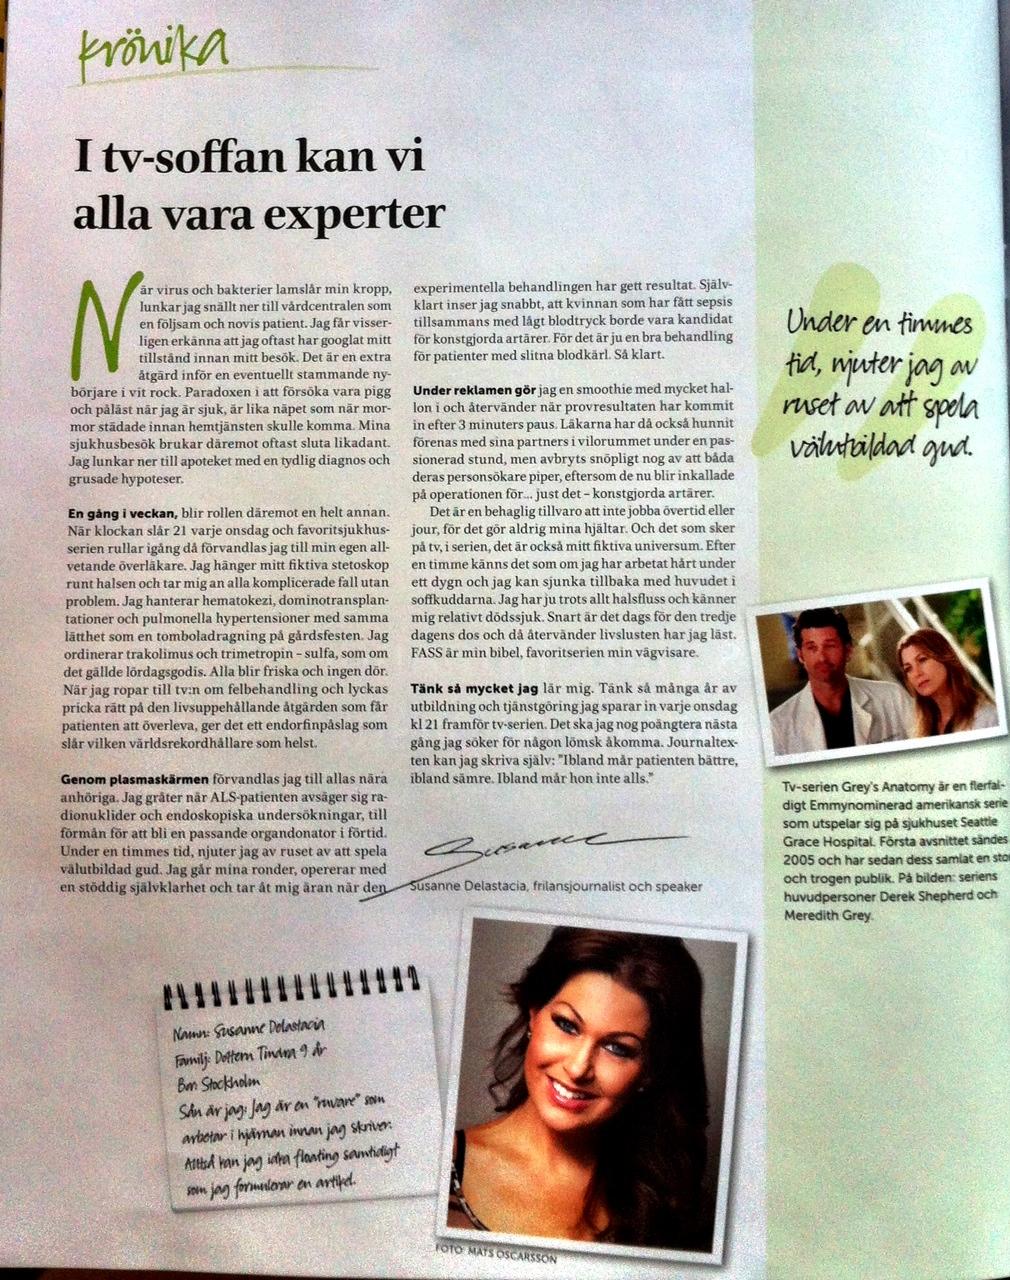 Bantjern oslo, Dating Apps I Bergsjö, Romantisk dejt råda